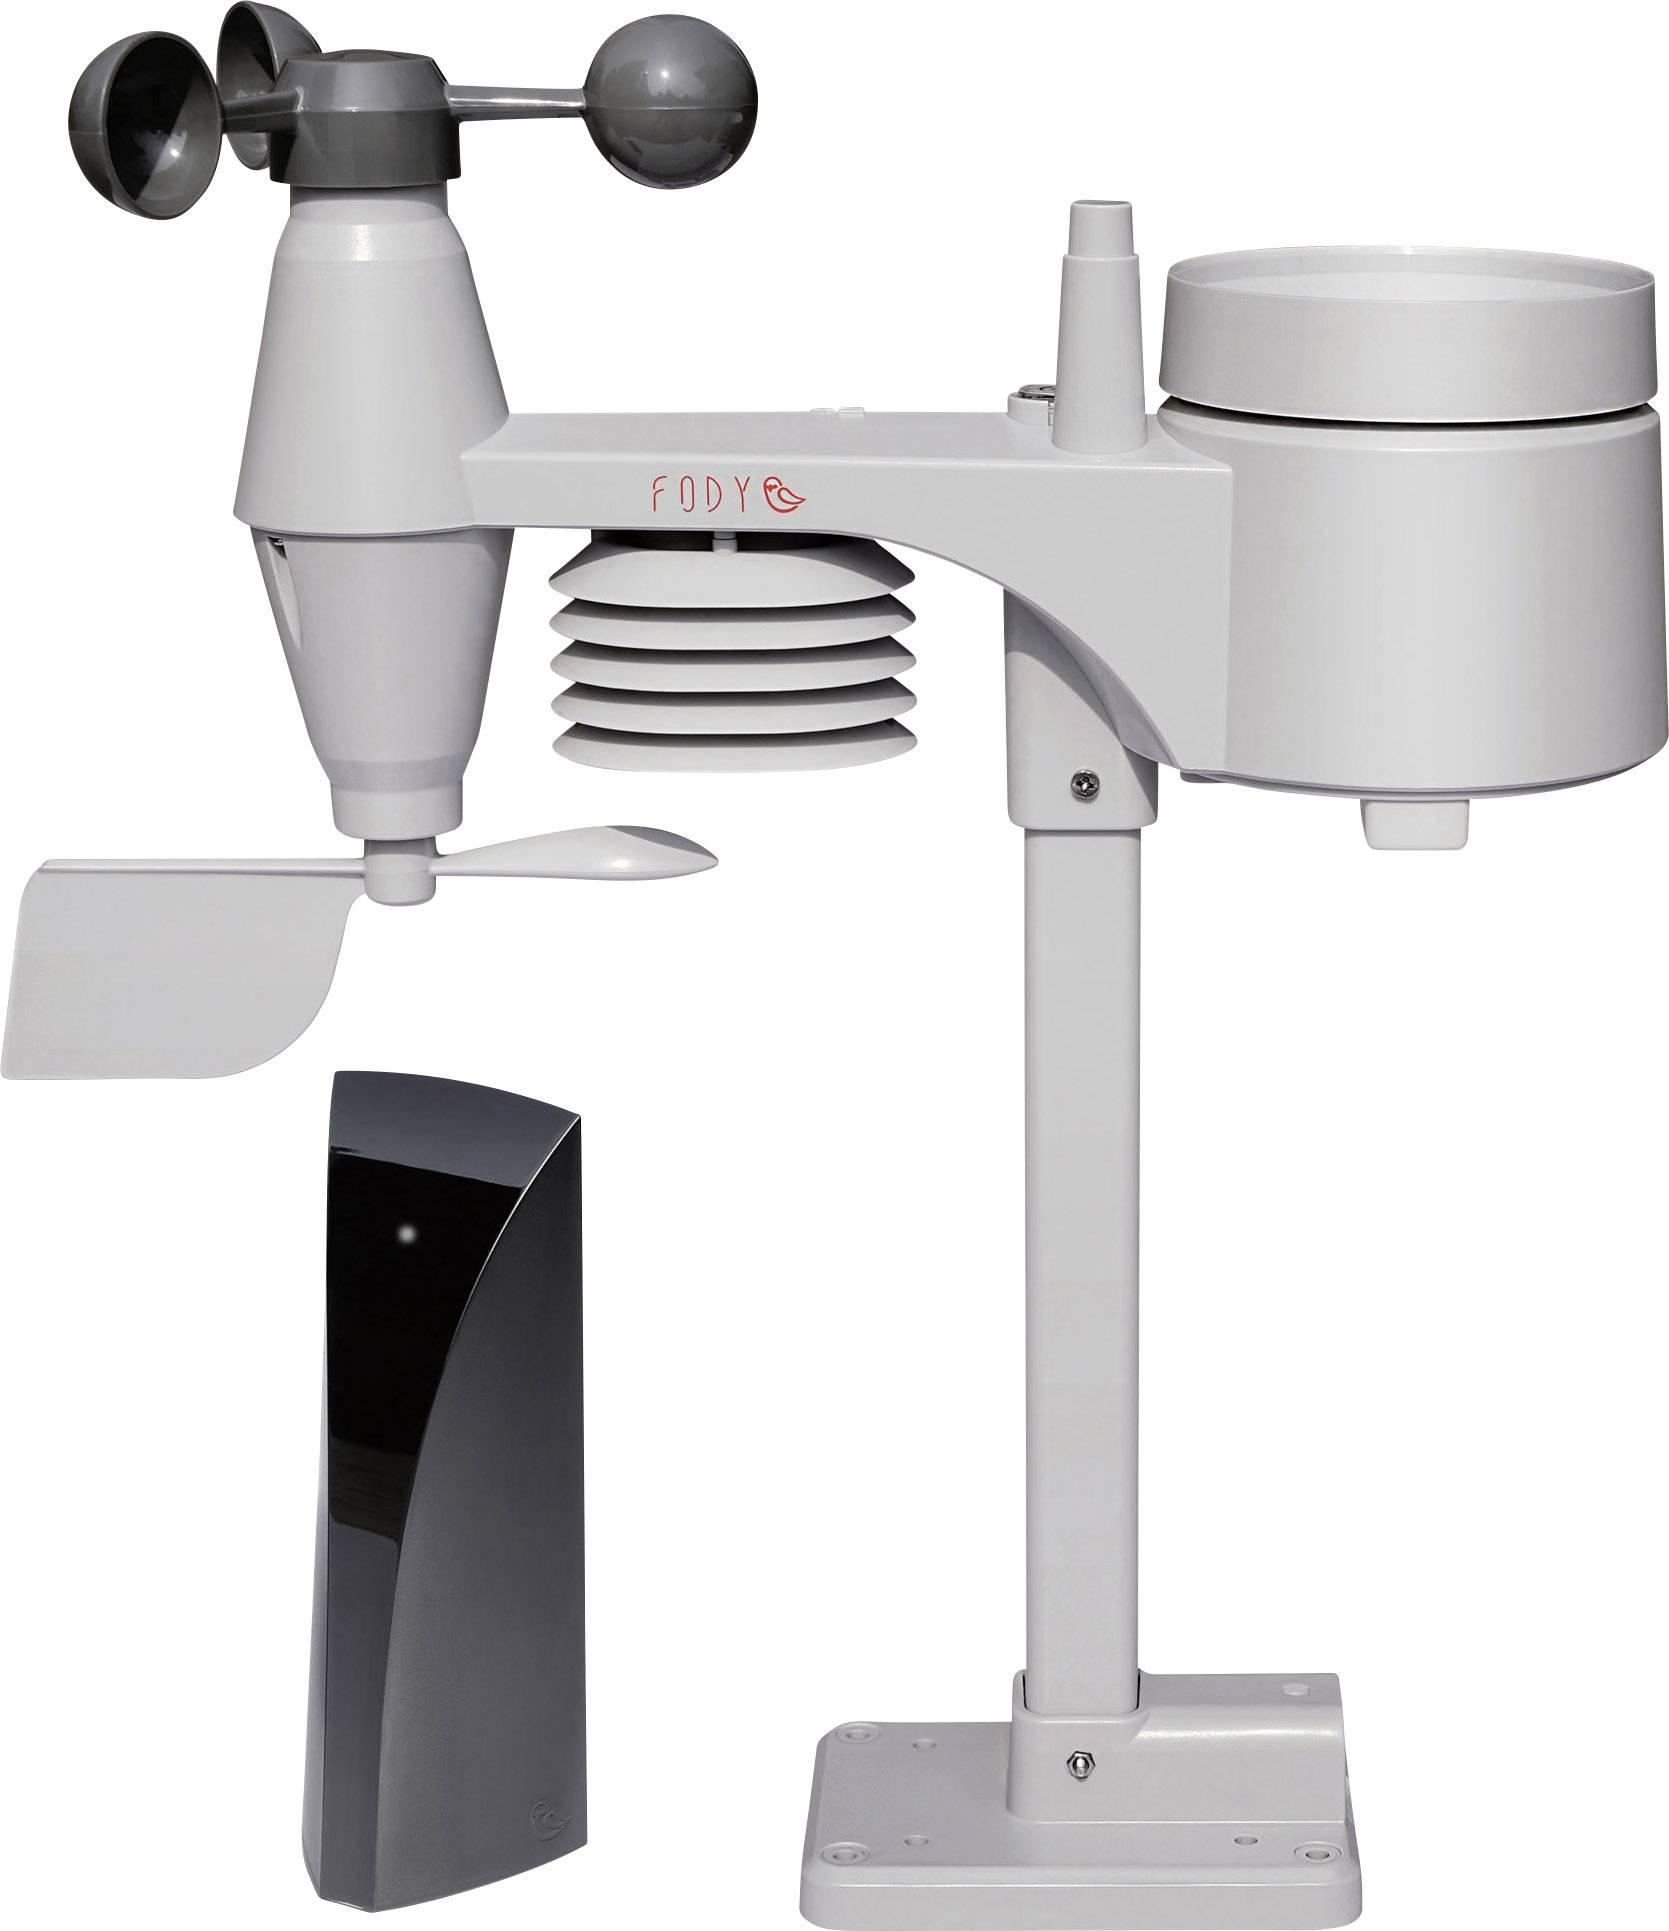 Bluetooth meteostanice Fody Tempus Pro E41